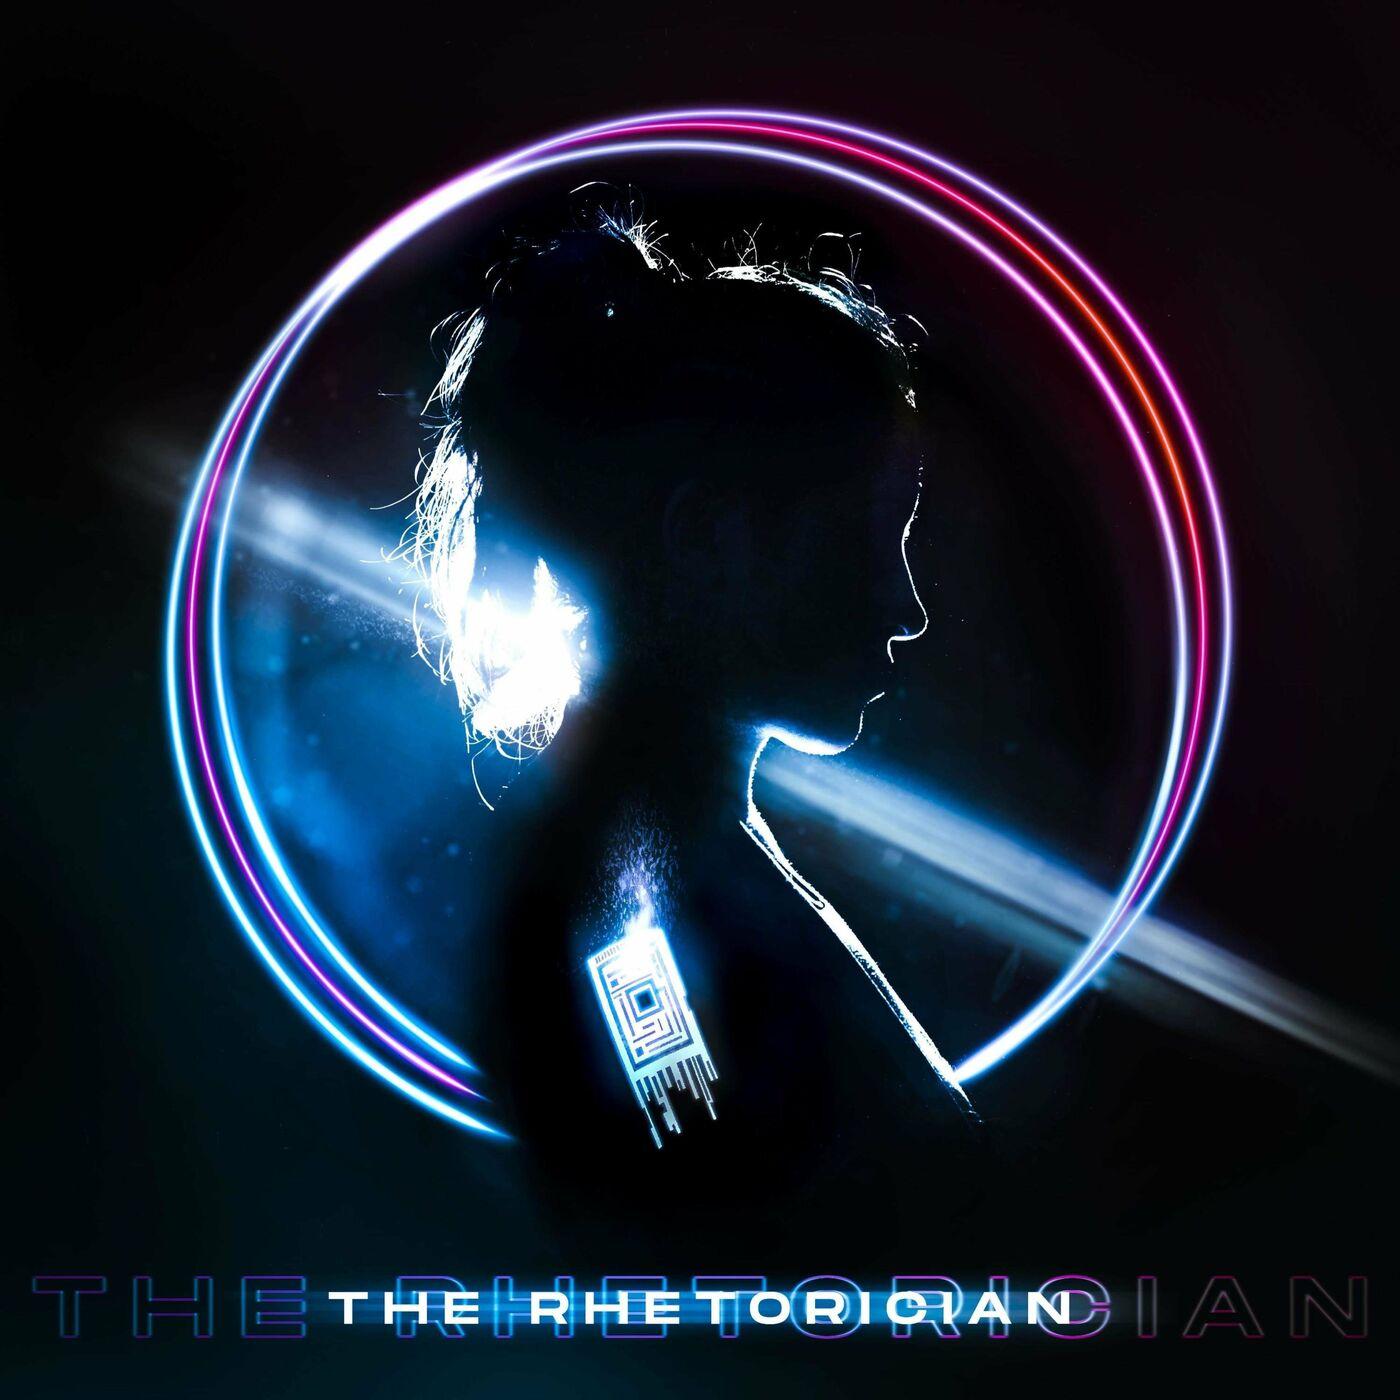 Coldharbour - The Rhetorician [single] (2020)